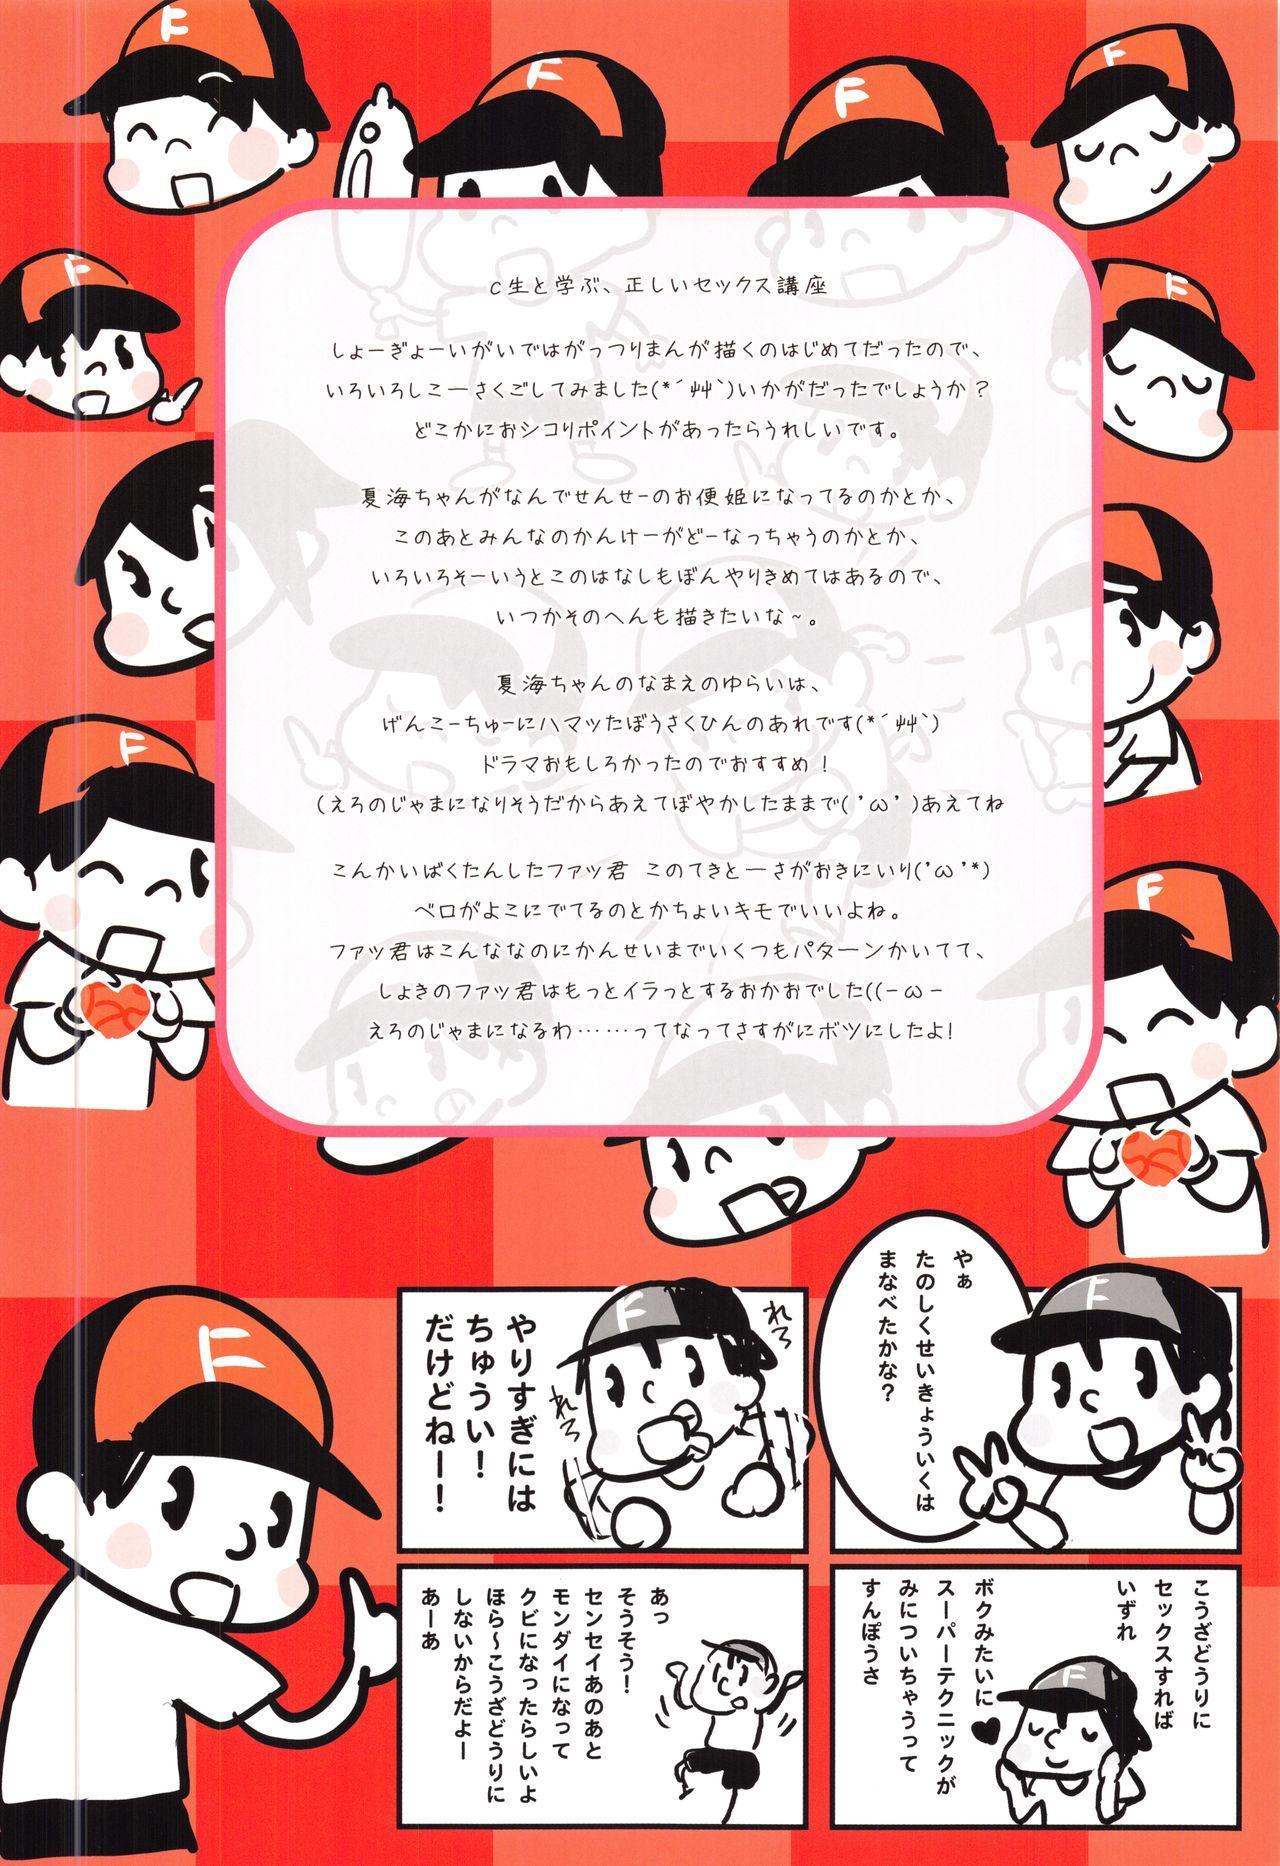 [Peromex (Tamanoi Peromekuri)] ©-sei de Manabu, Tadashii Sex Kouza   JC Hands-On Proper Sex Lecture [English] [bientaimon] [2019-11-09] 32